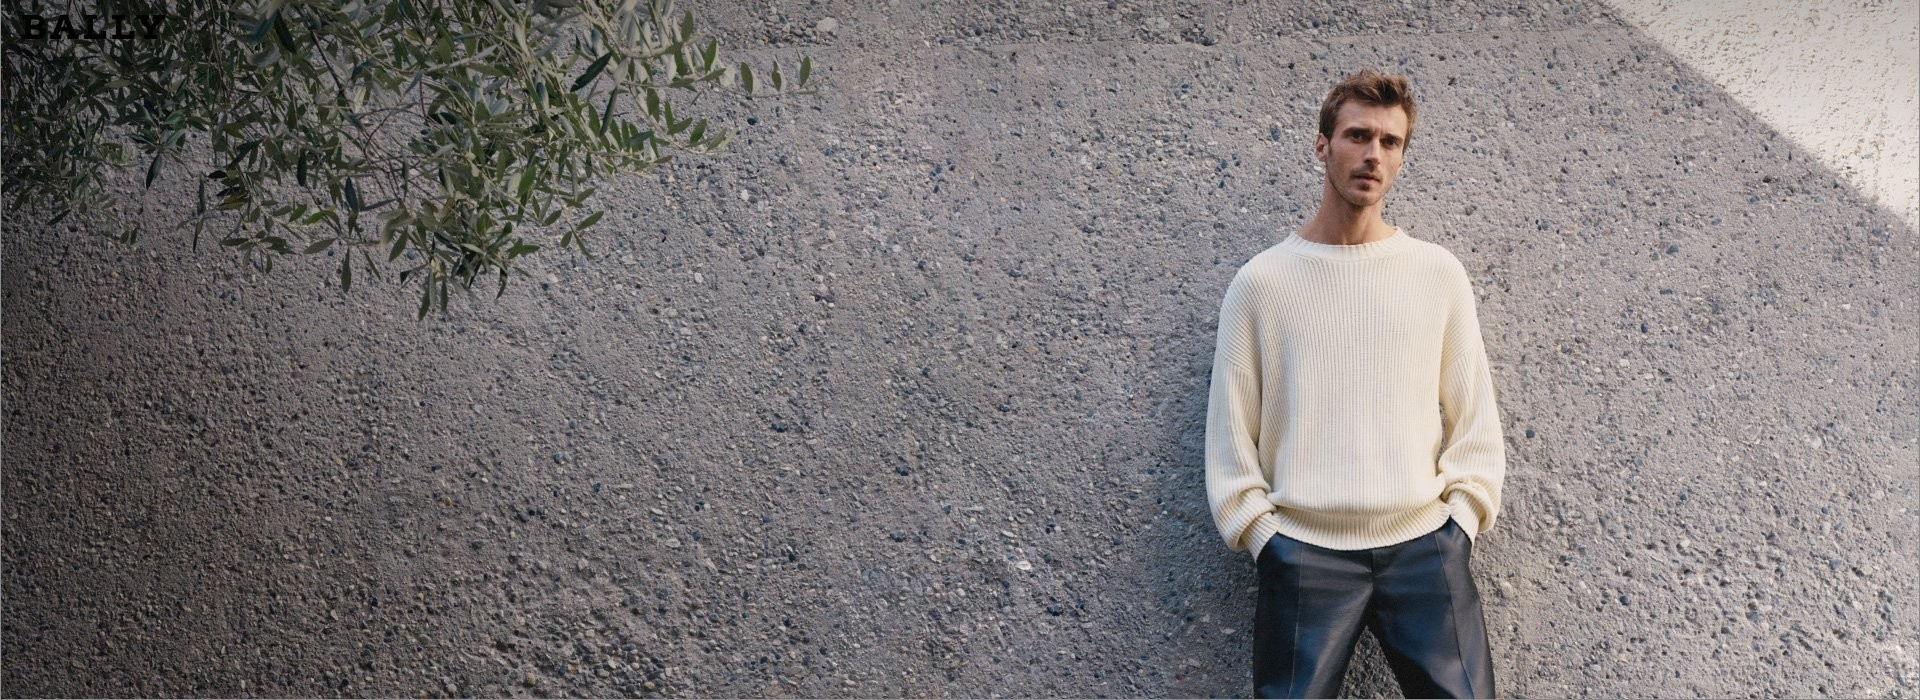 CLEMENT CHABERNAUD: BALLY// PH. ZOË GHERTNER